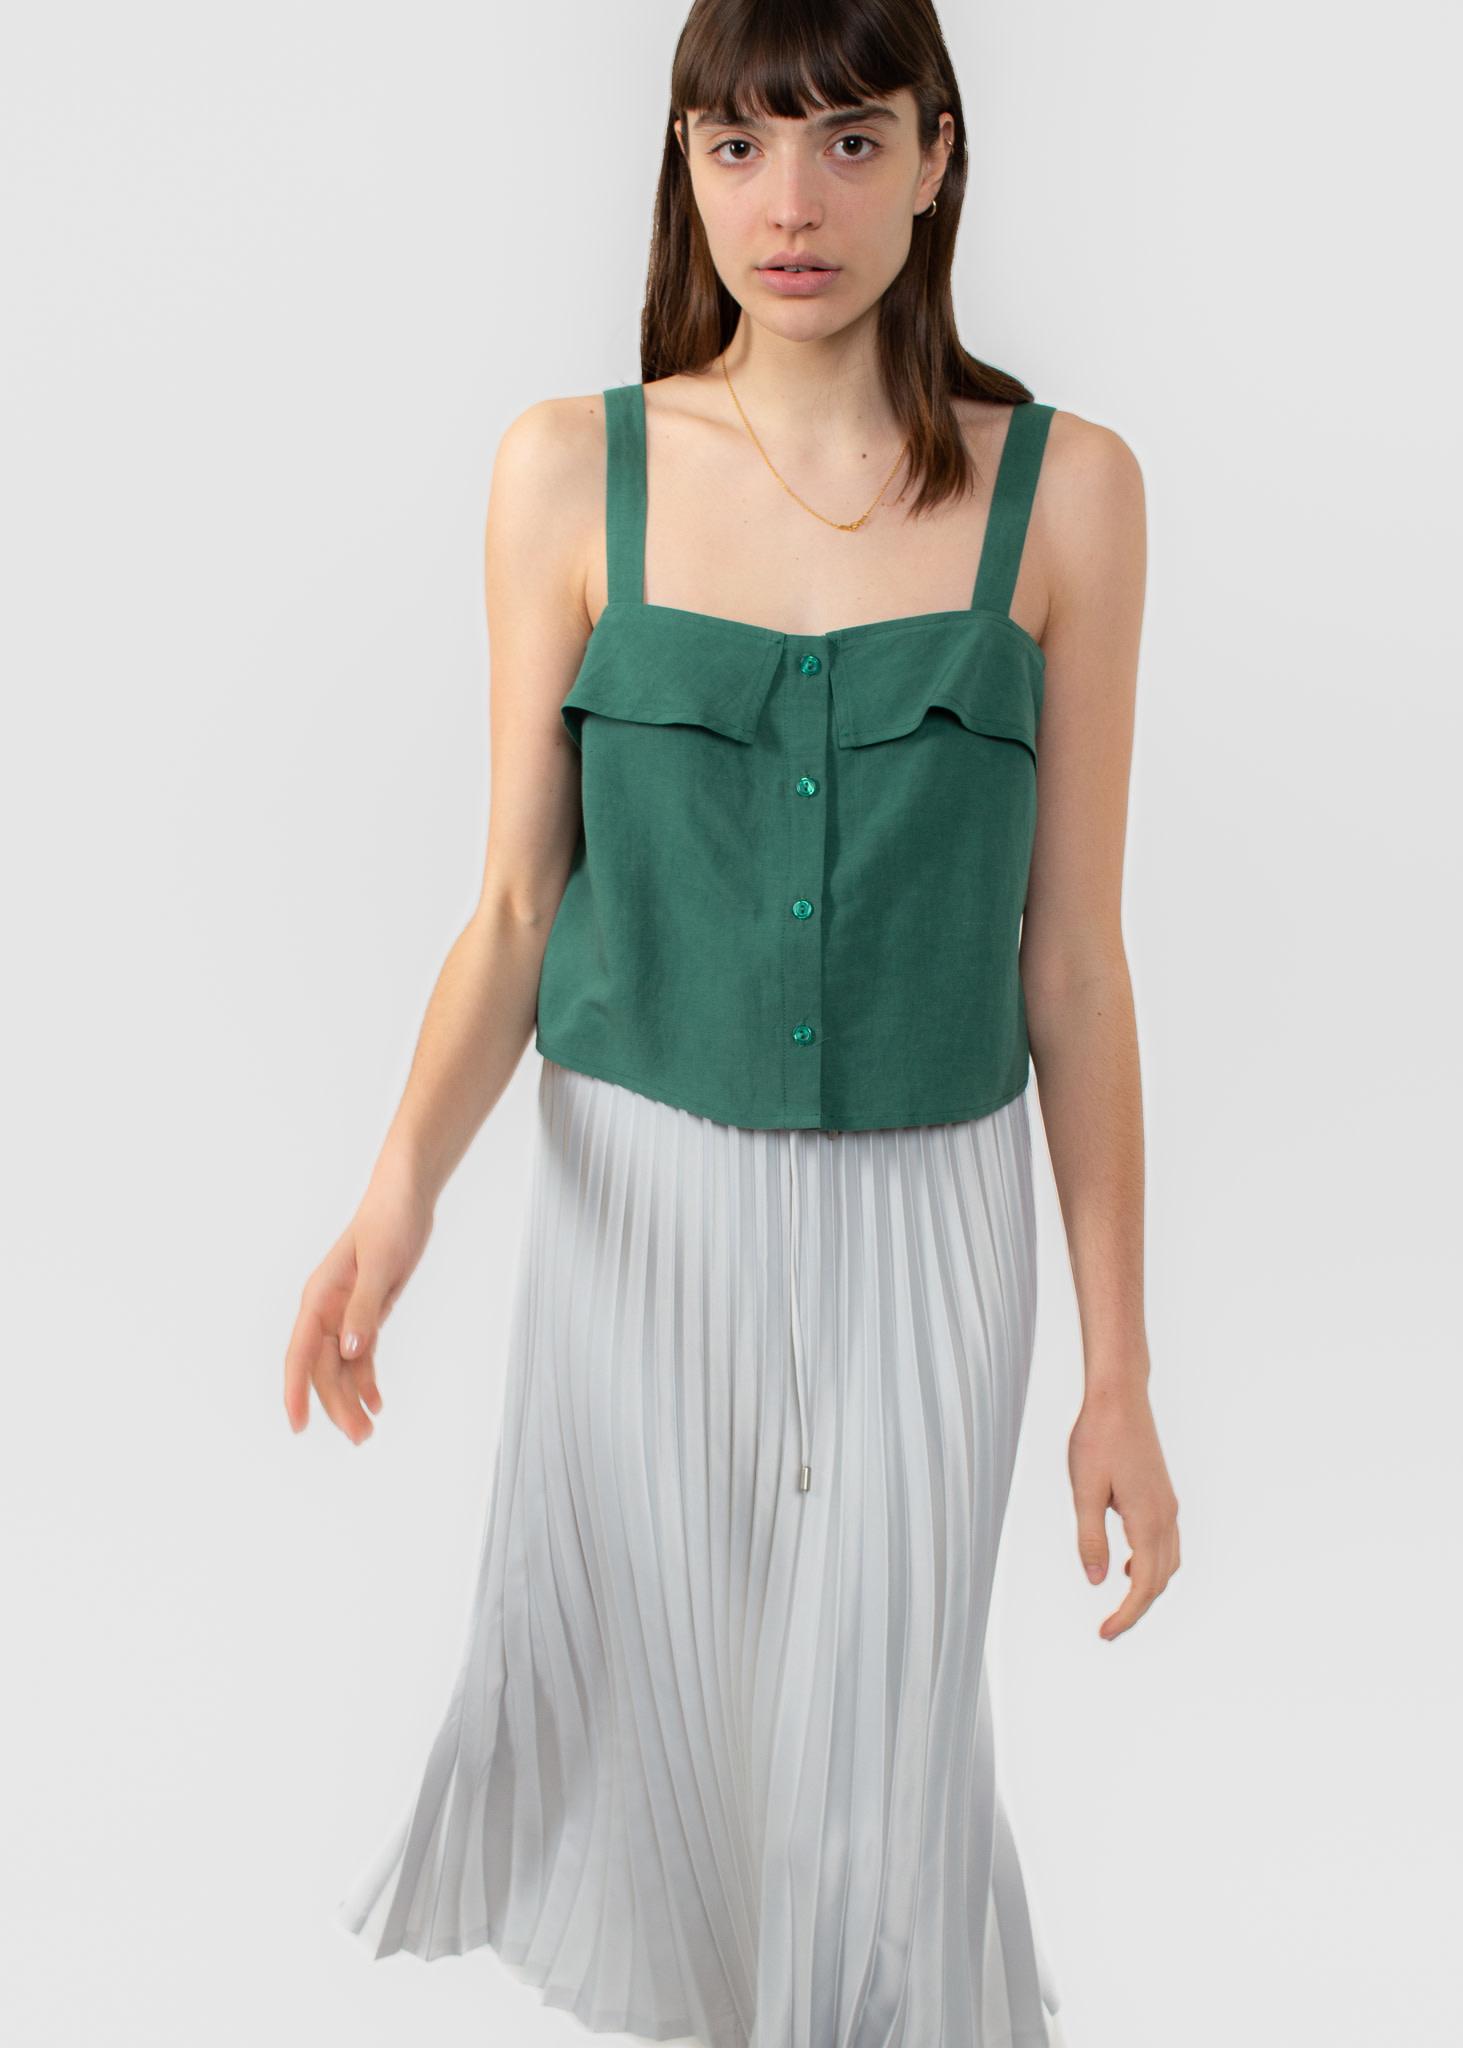 EVE GRAVEL Bohémienne camisole